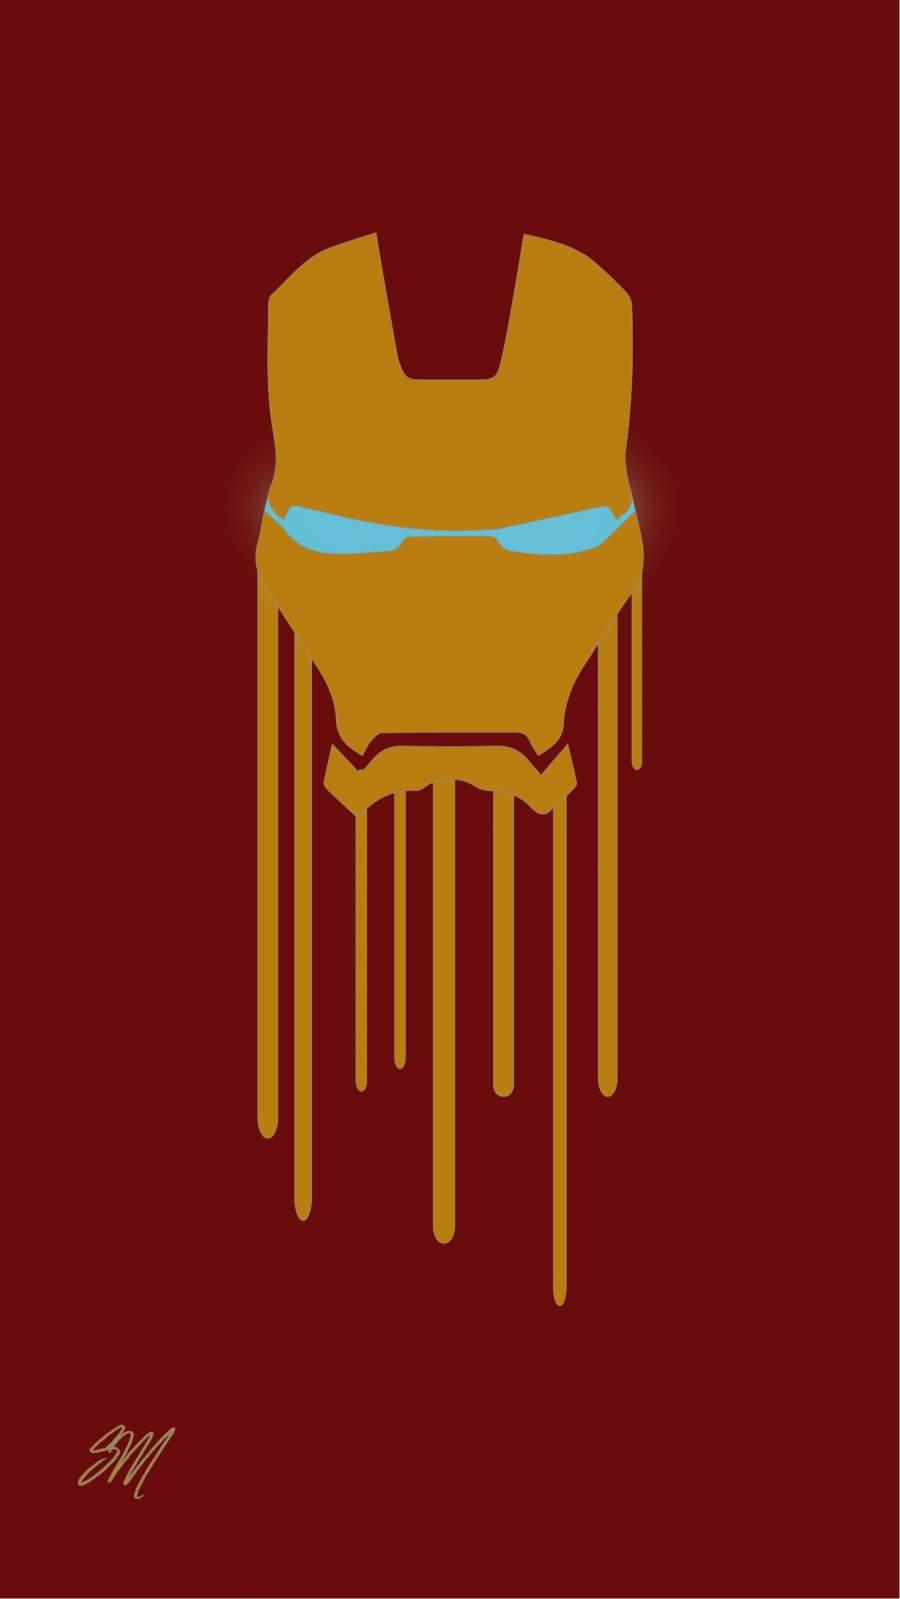 Bleeding Iron Man iPhone Wallpaper